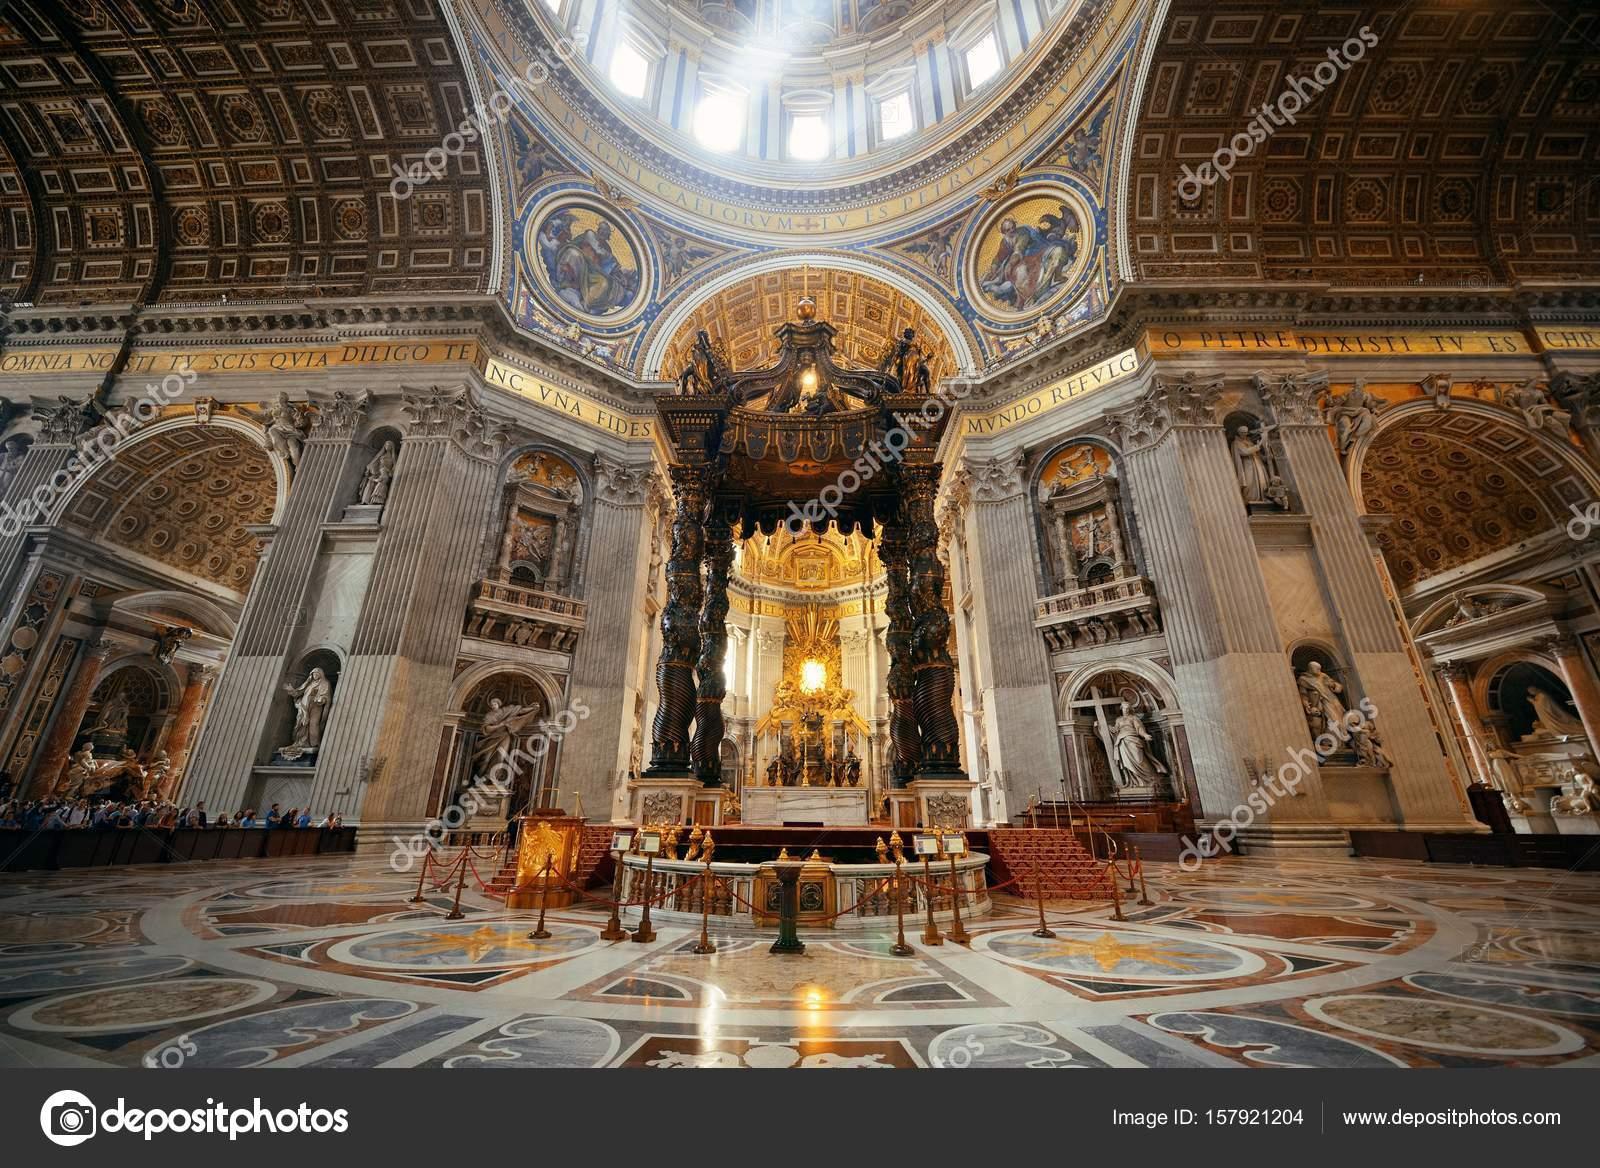 https://st3.depositphotos.com/1030808/15792/i/1600/depositphotos_157921204-stock-photo-st-peters-basilica-interior.jpg